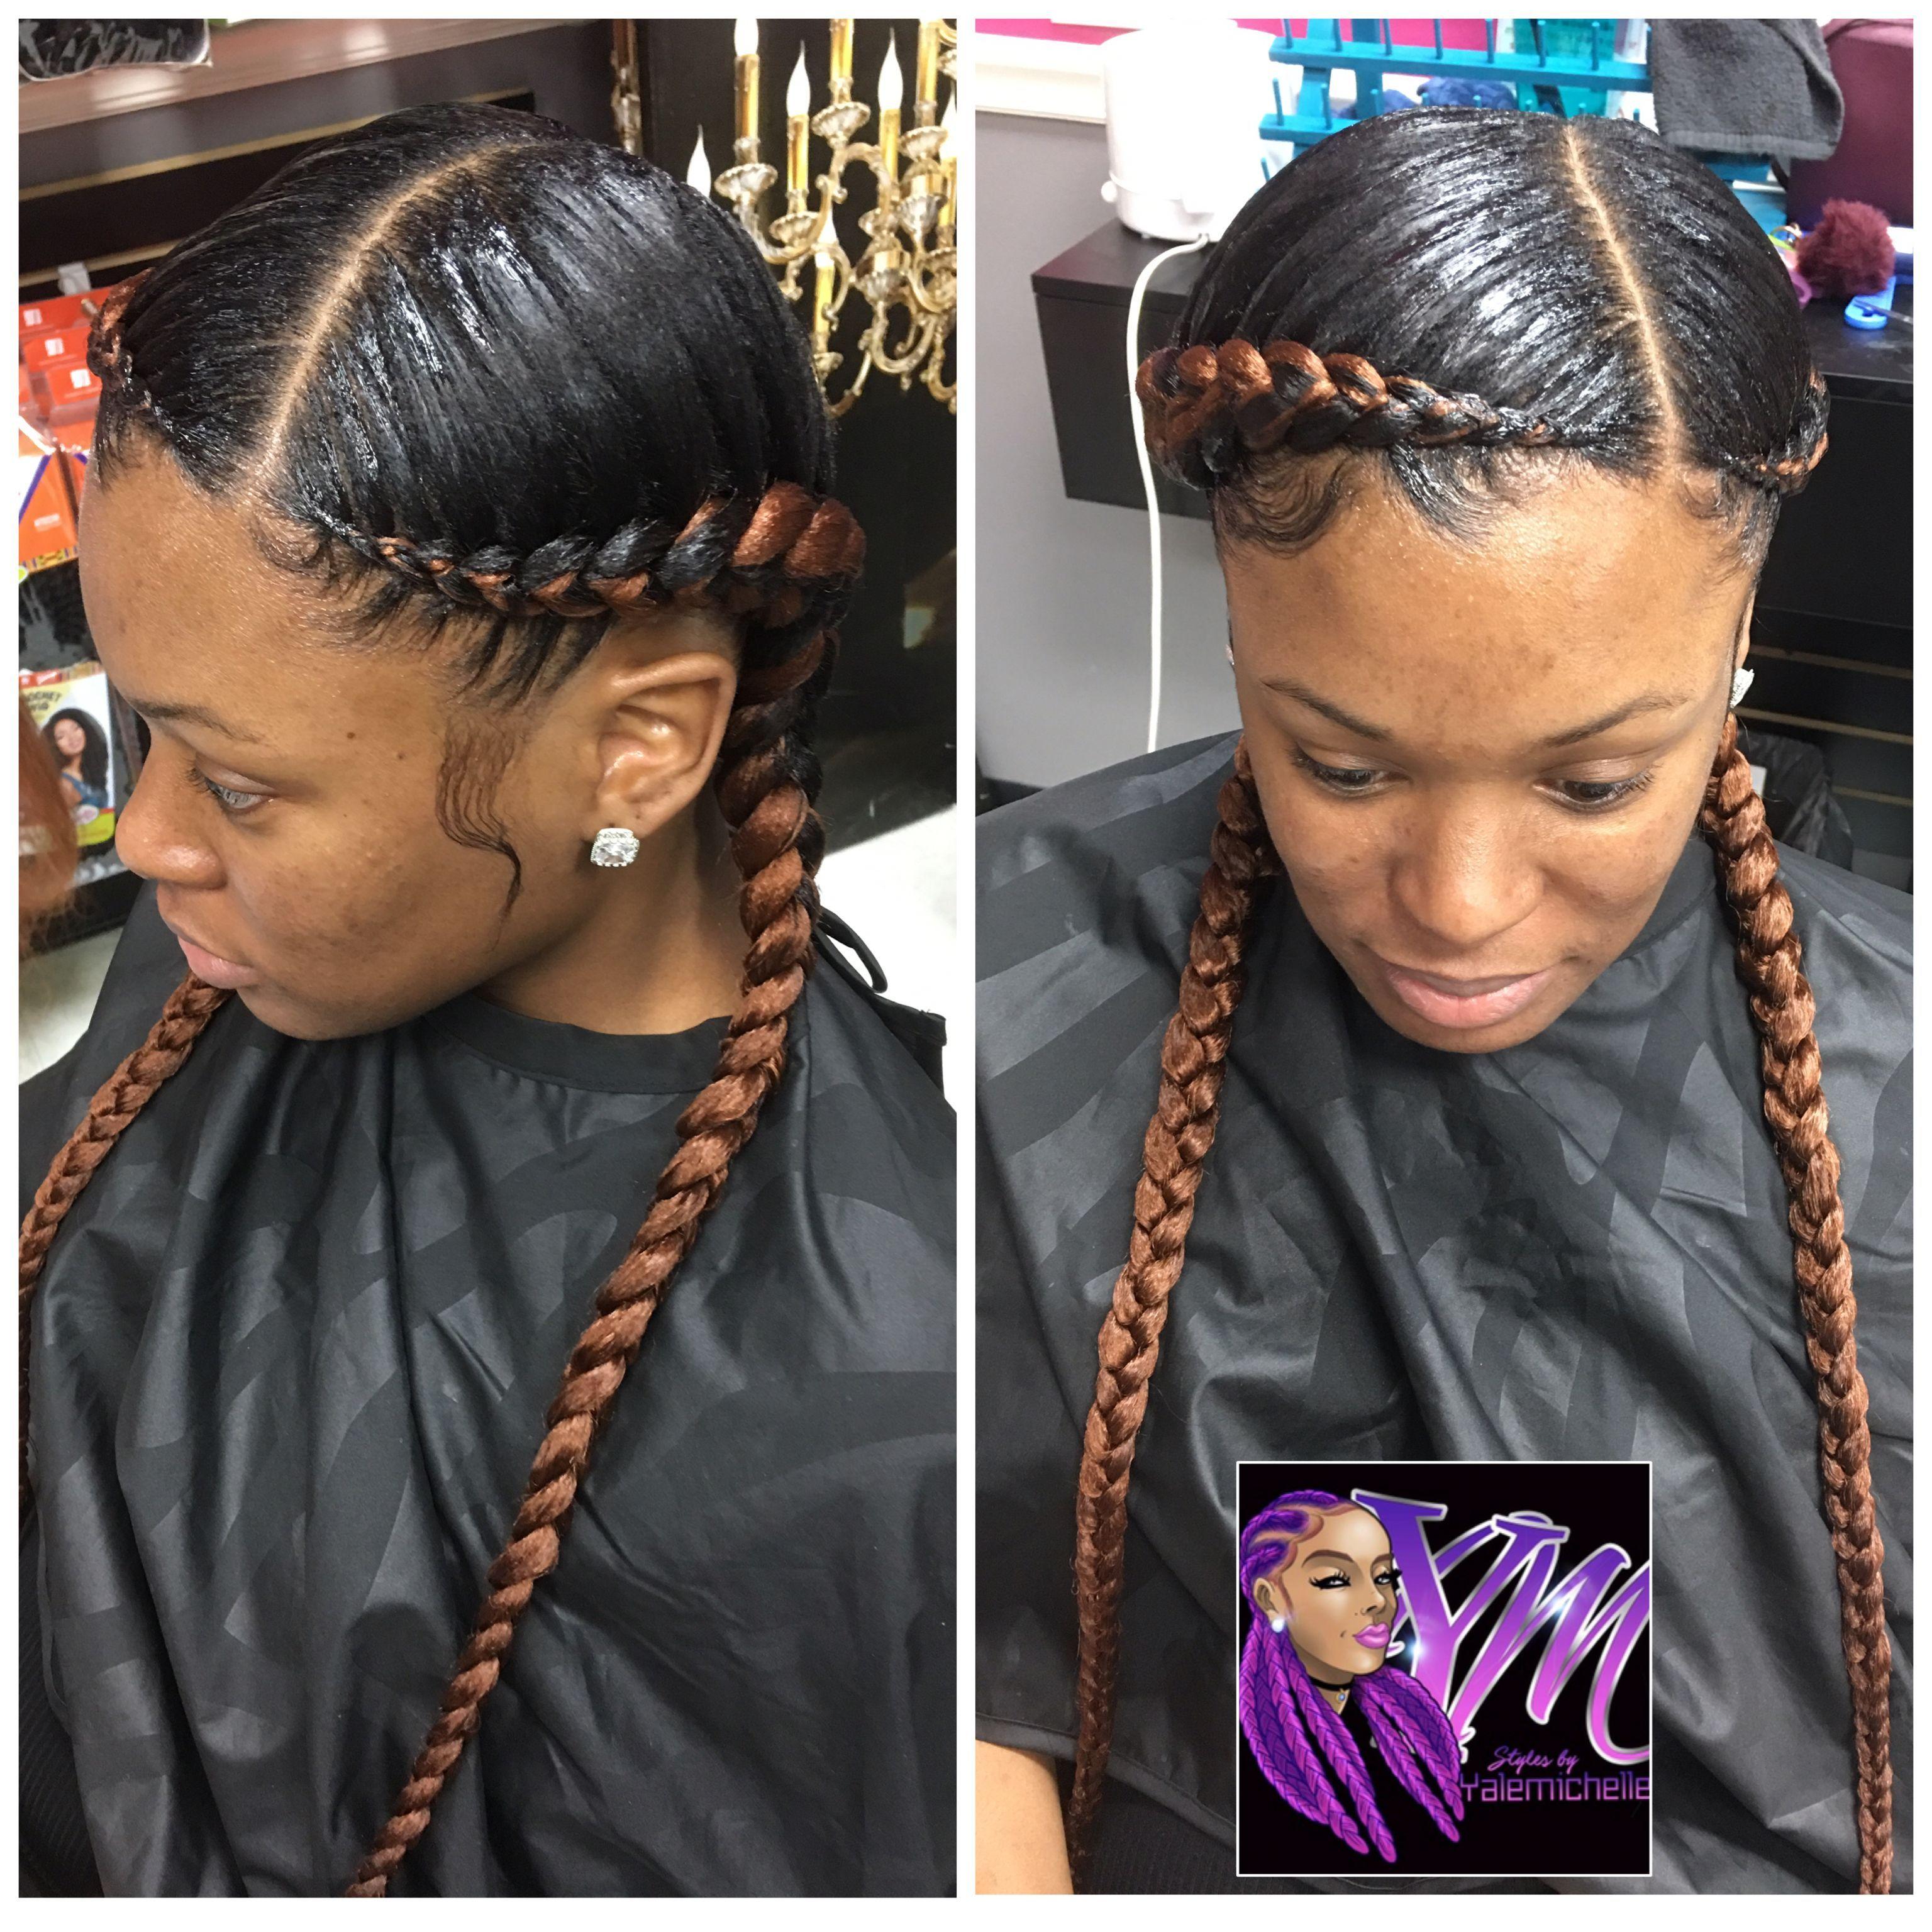 Feedin Braids Https Instagram Com P Bxkc2zvfyaq Hair Styles Cool Braid Hairstyles Braided Hairstyles